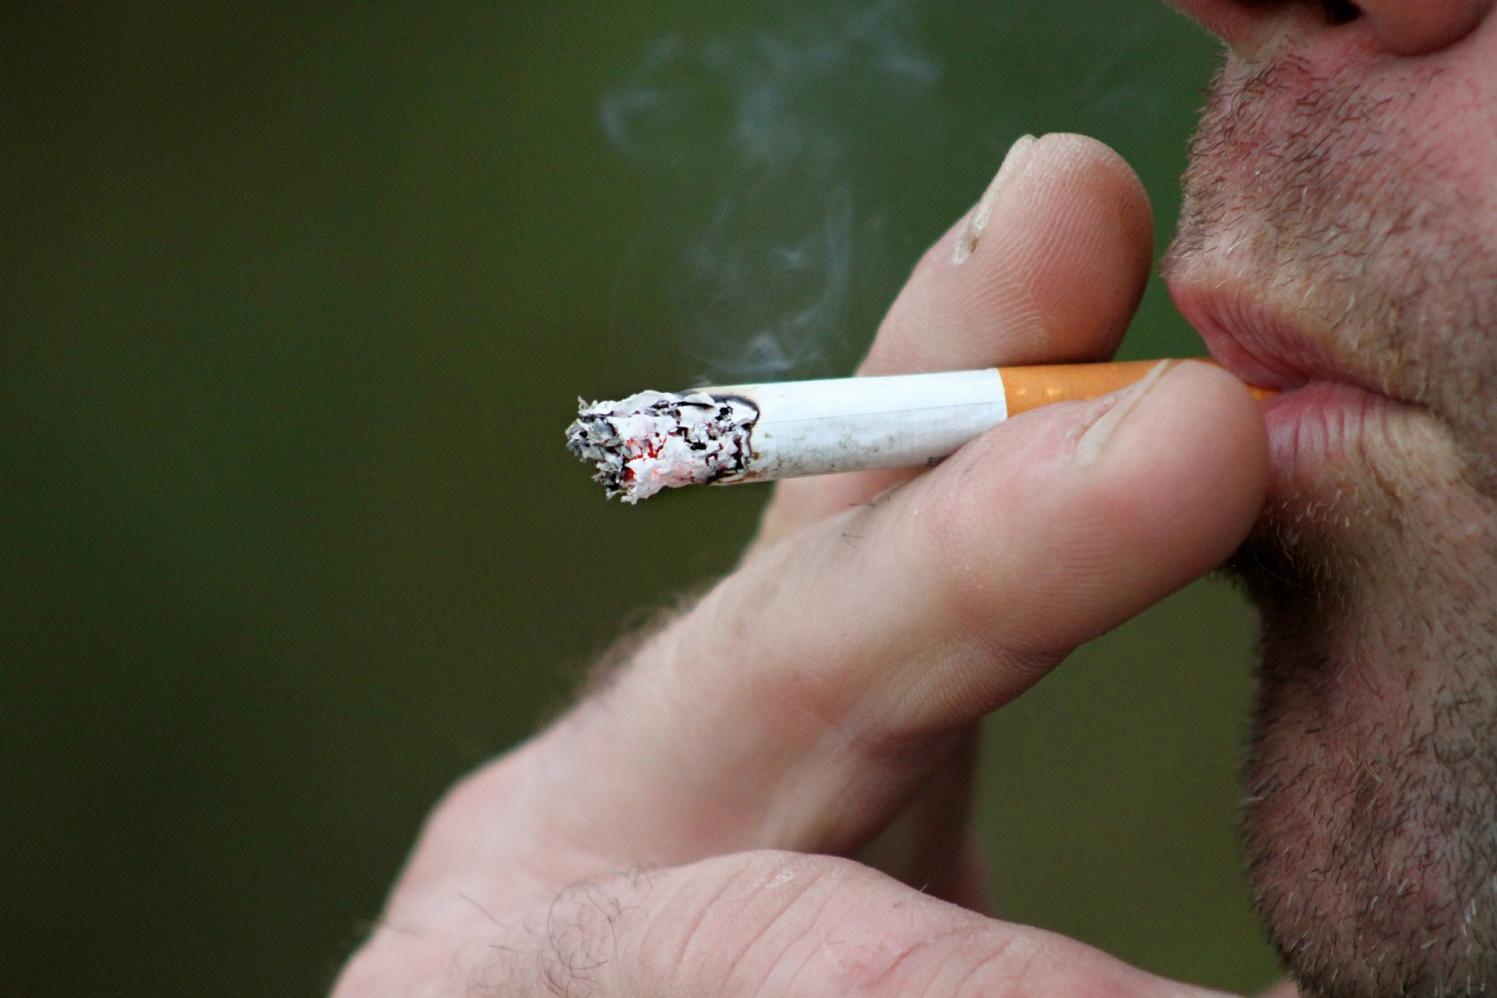 Medical oferece grupo de apoio para ajudar a parar de fumar